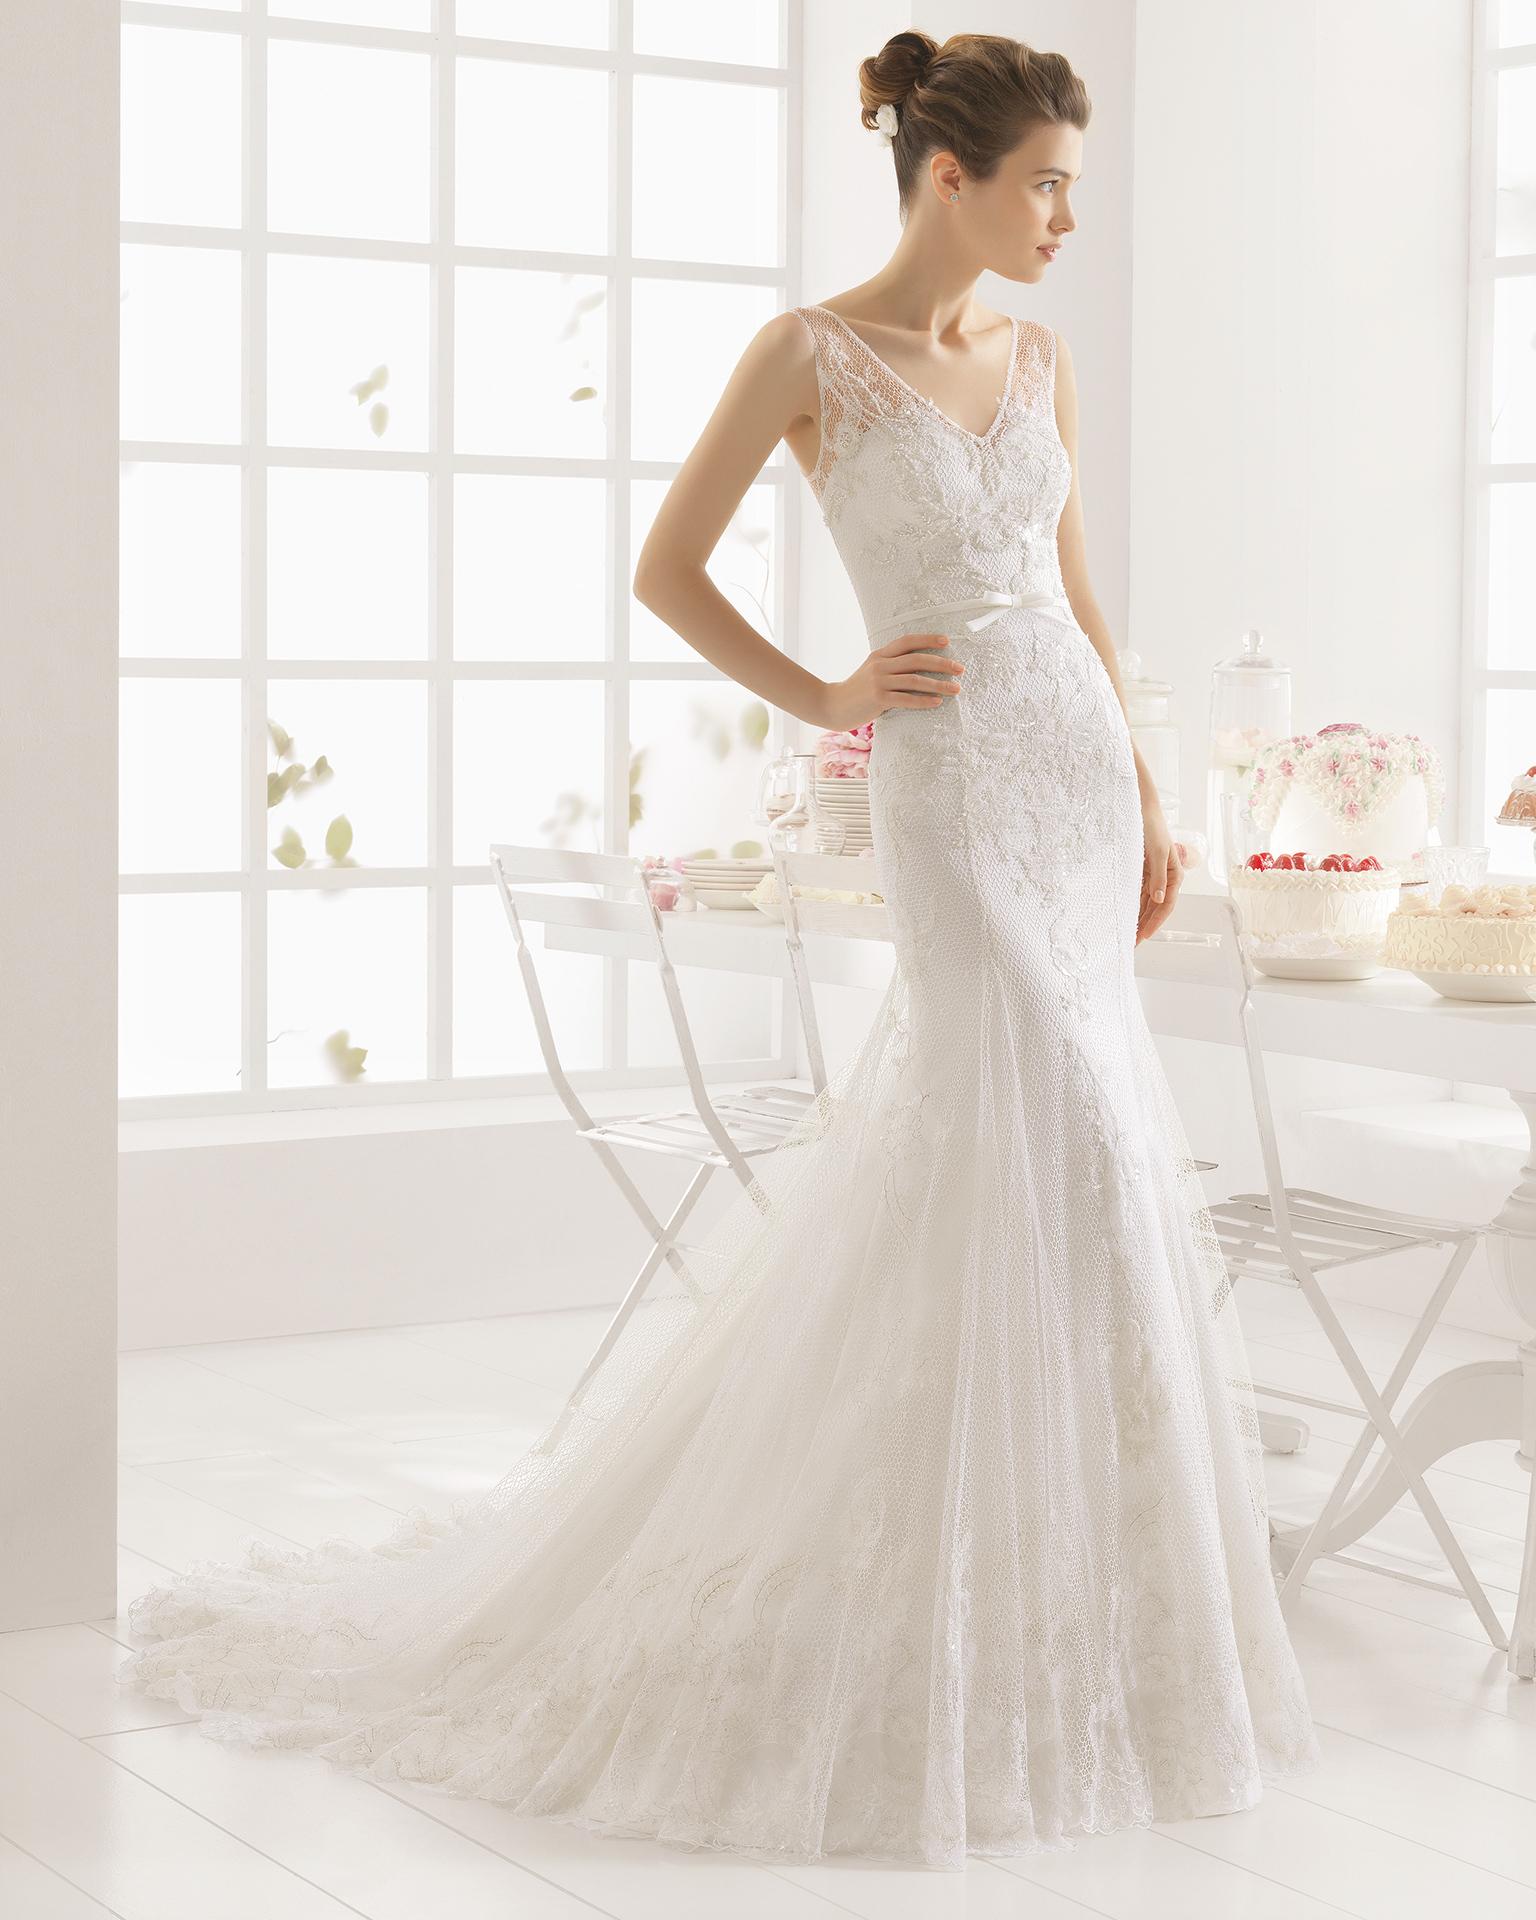 MAURO beaded lace and mesh wedding dress.